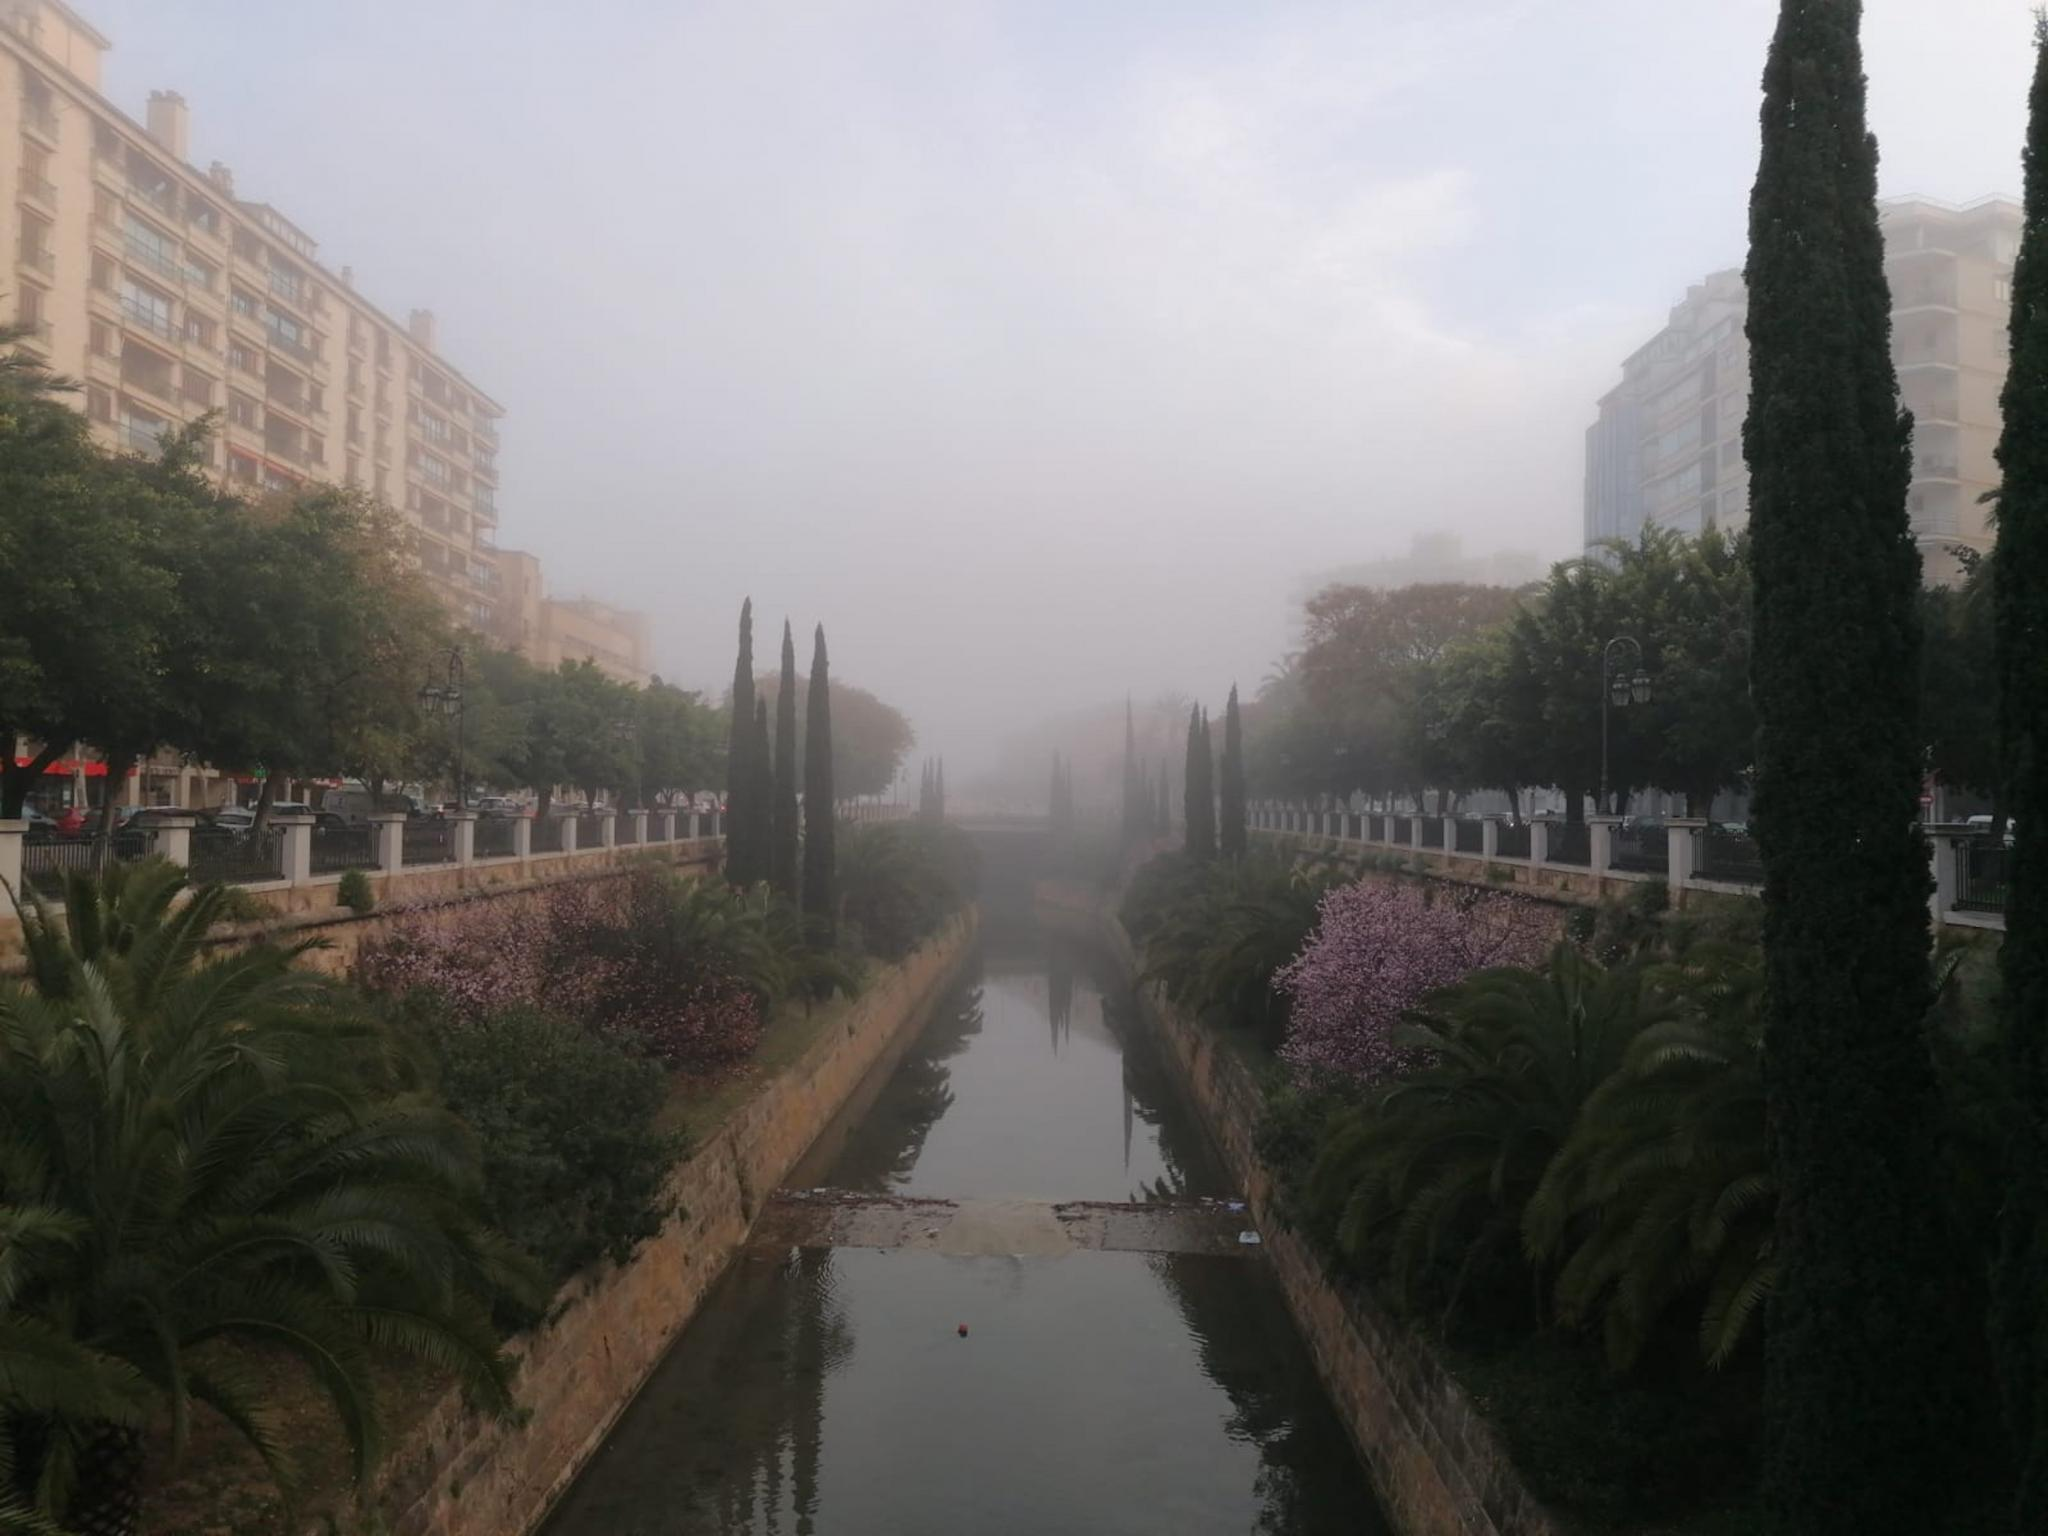 Paseo Mallorca in Palma shrouded in fog.